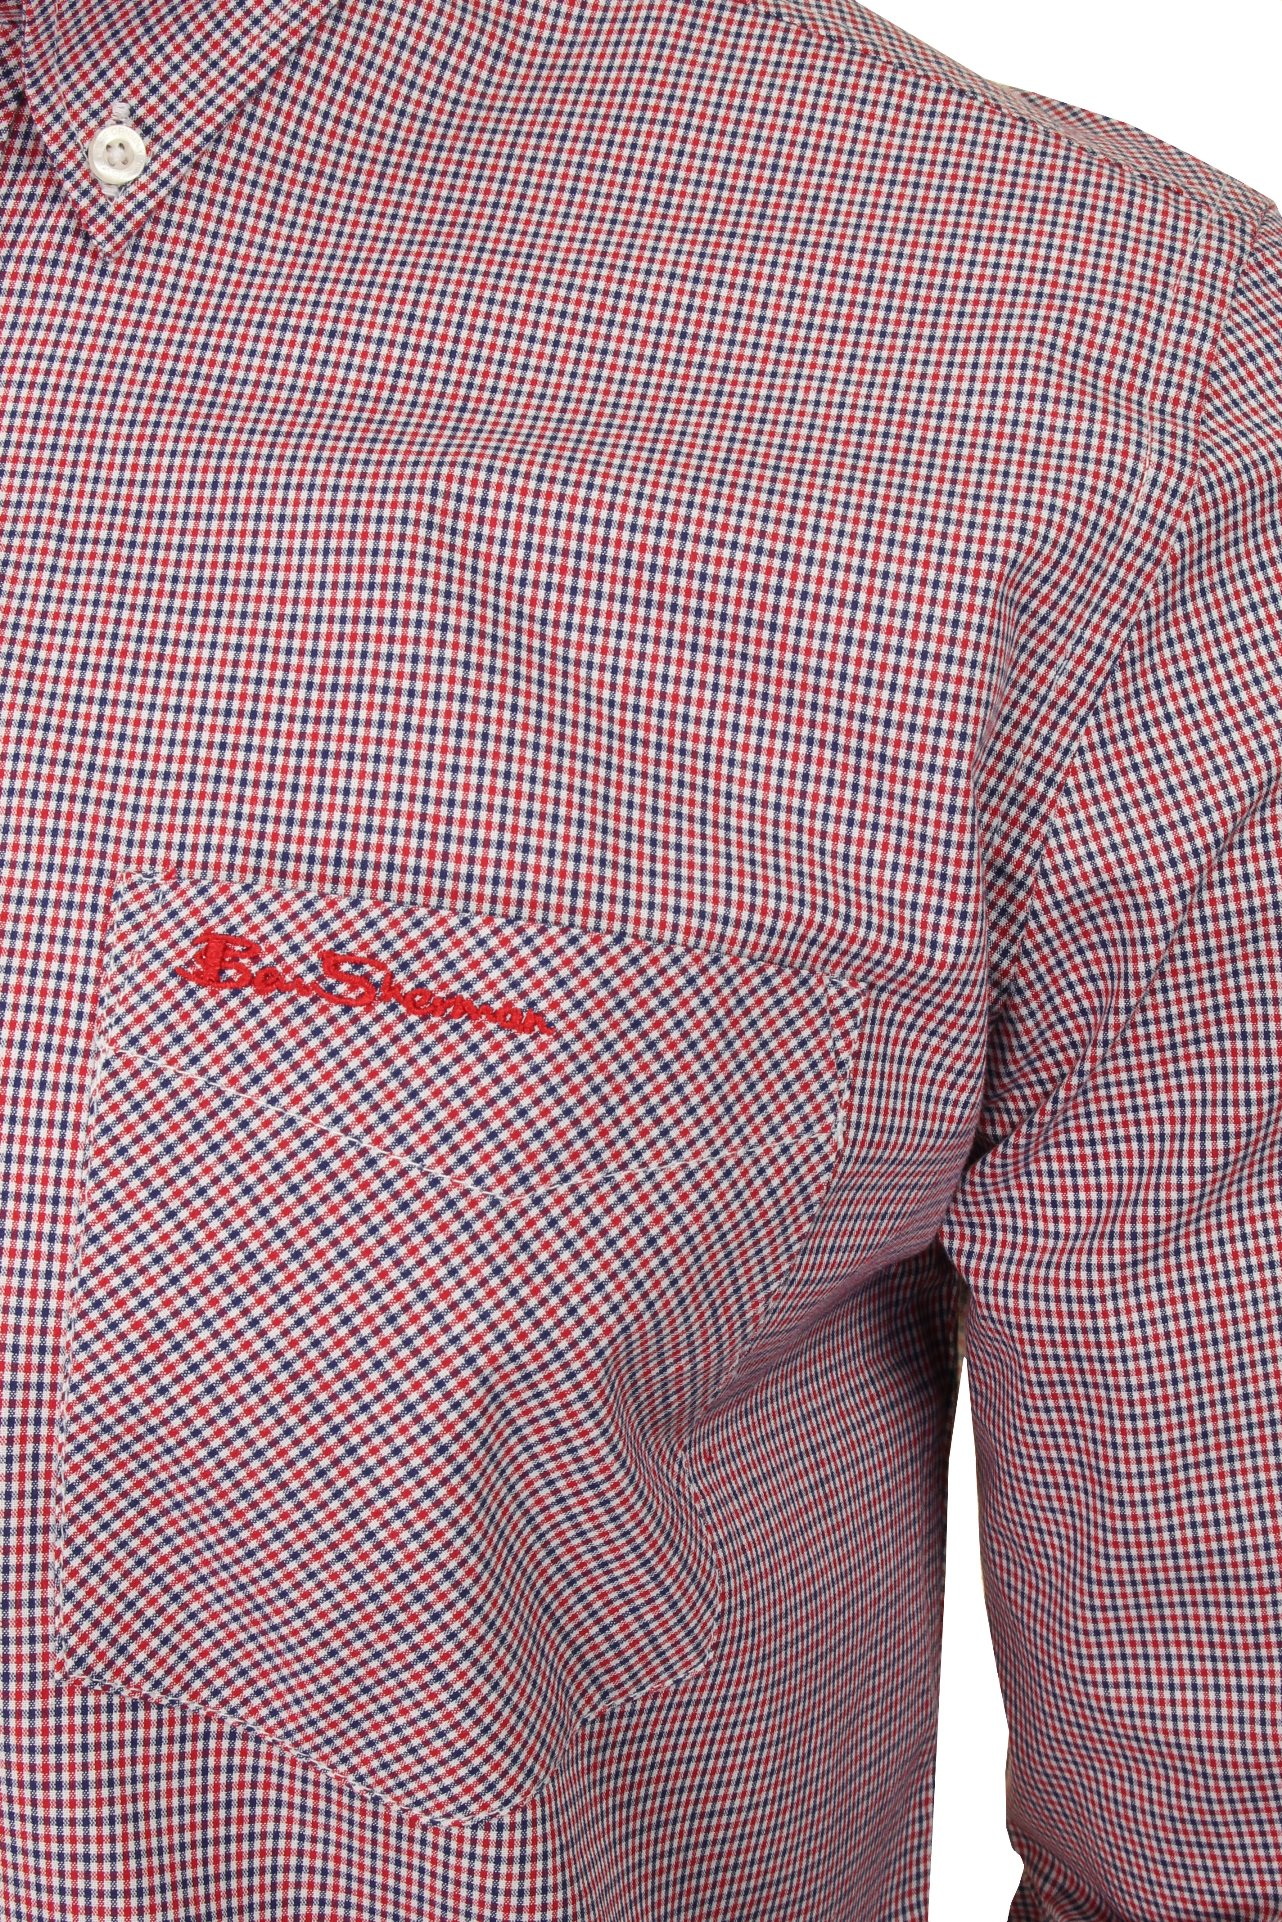 Ben-Sherman-Men-039-s-Long-Sleeved-Gingham-Check-Shirt thumbnail 7